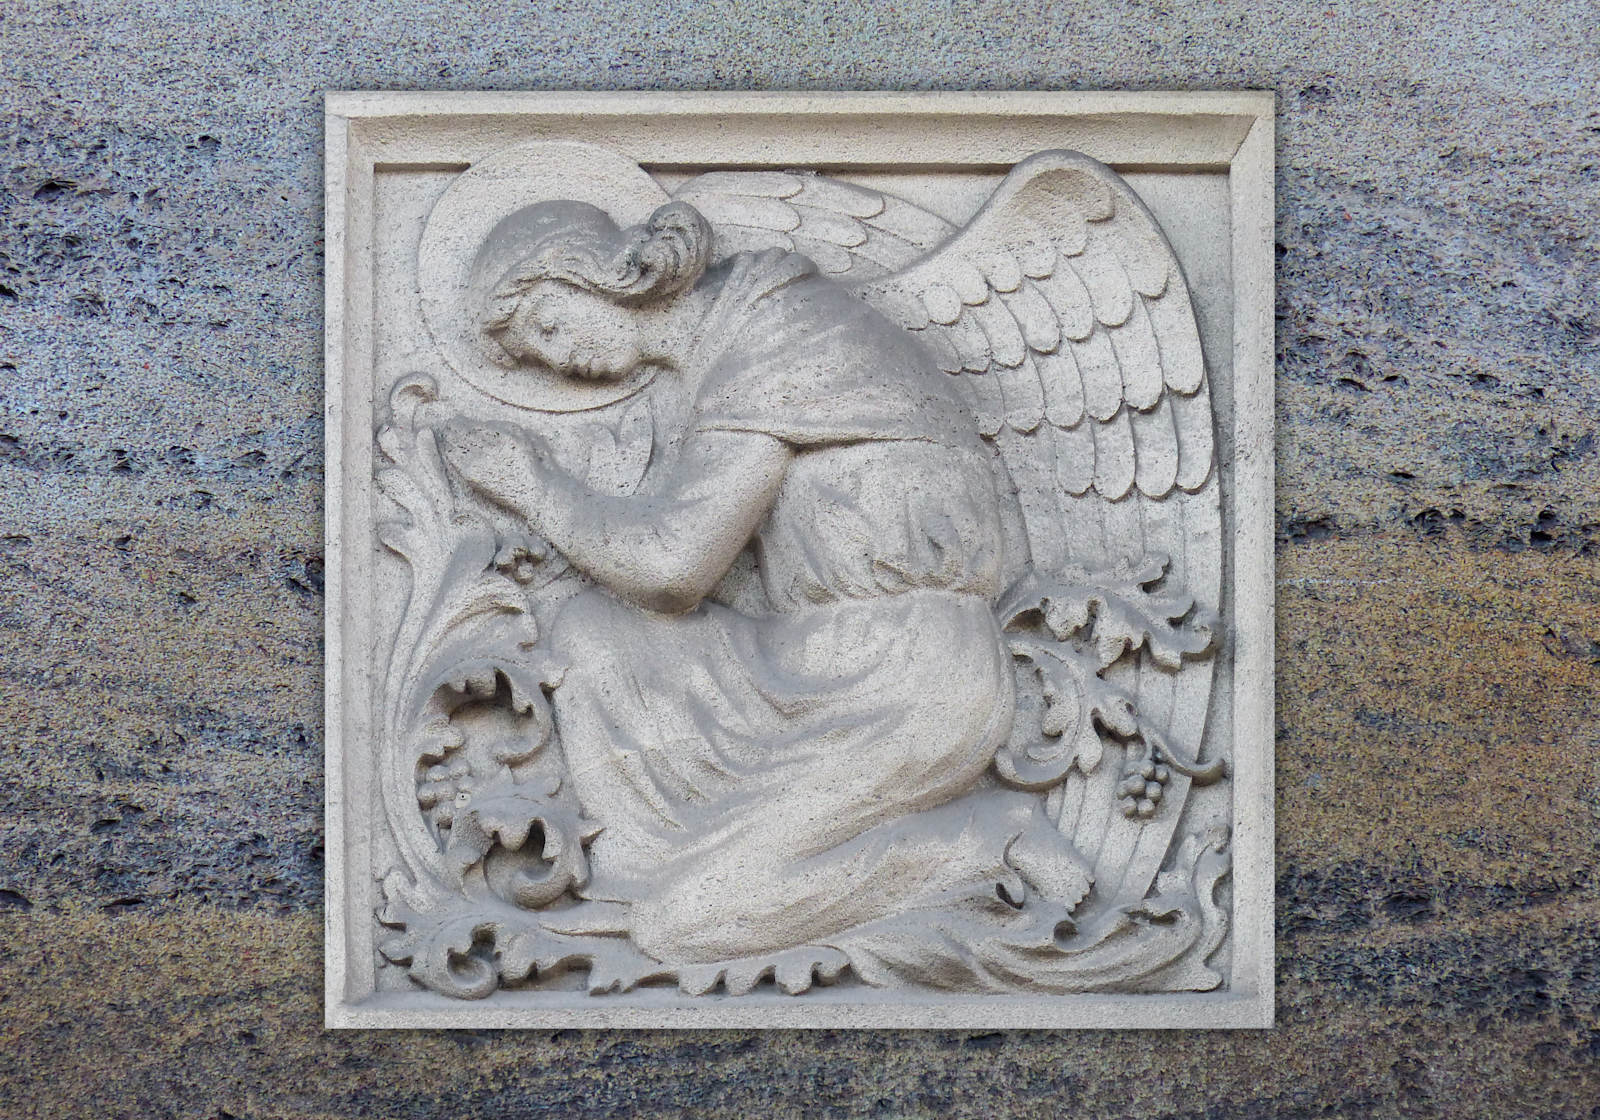 Chapelle du Voeu, Tourcoing - Ange en bas-relief